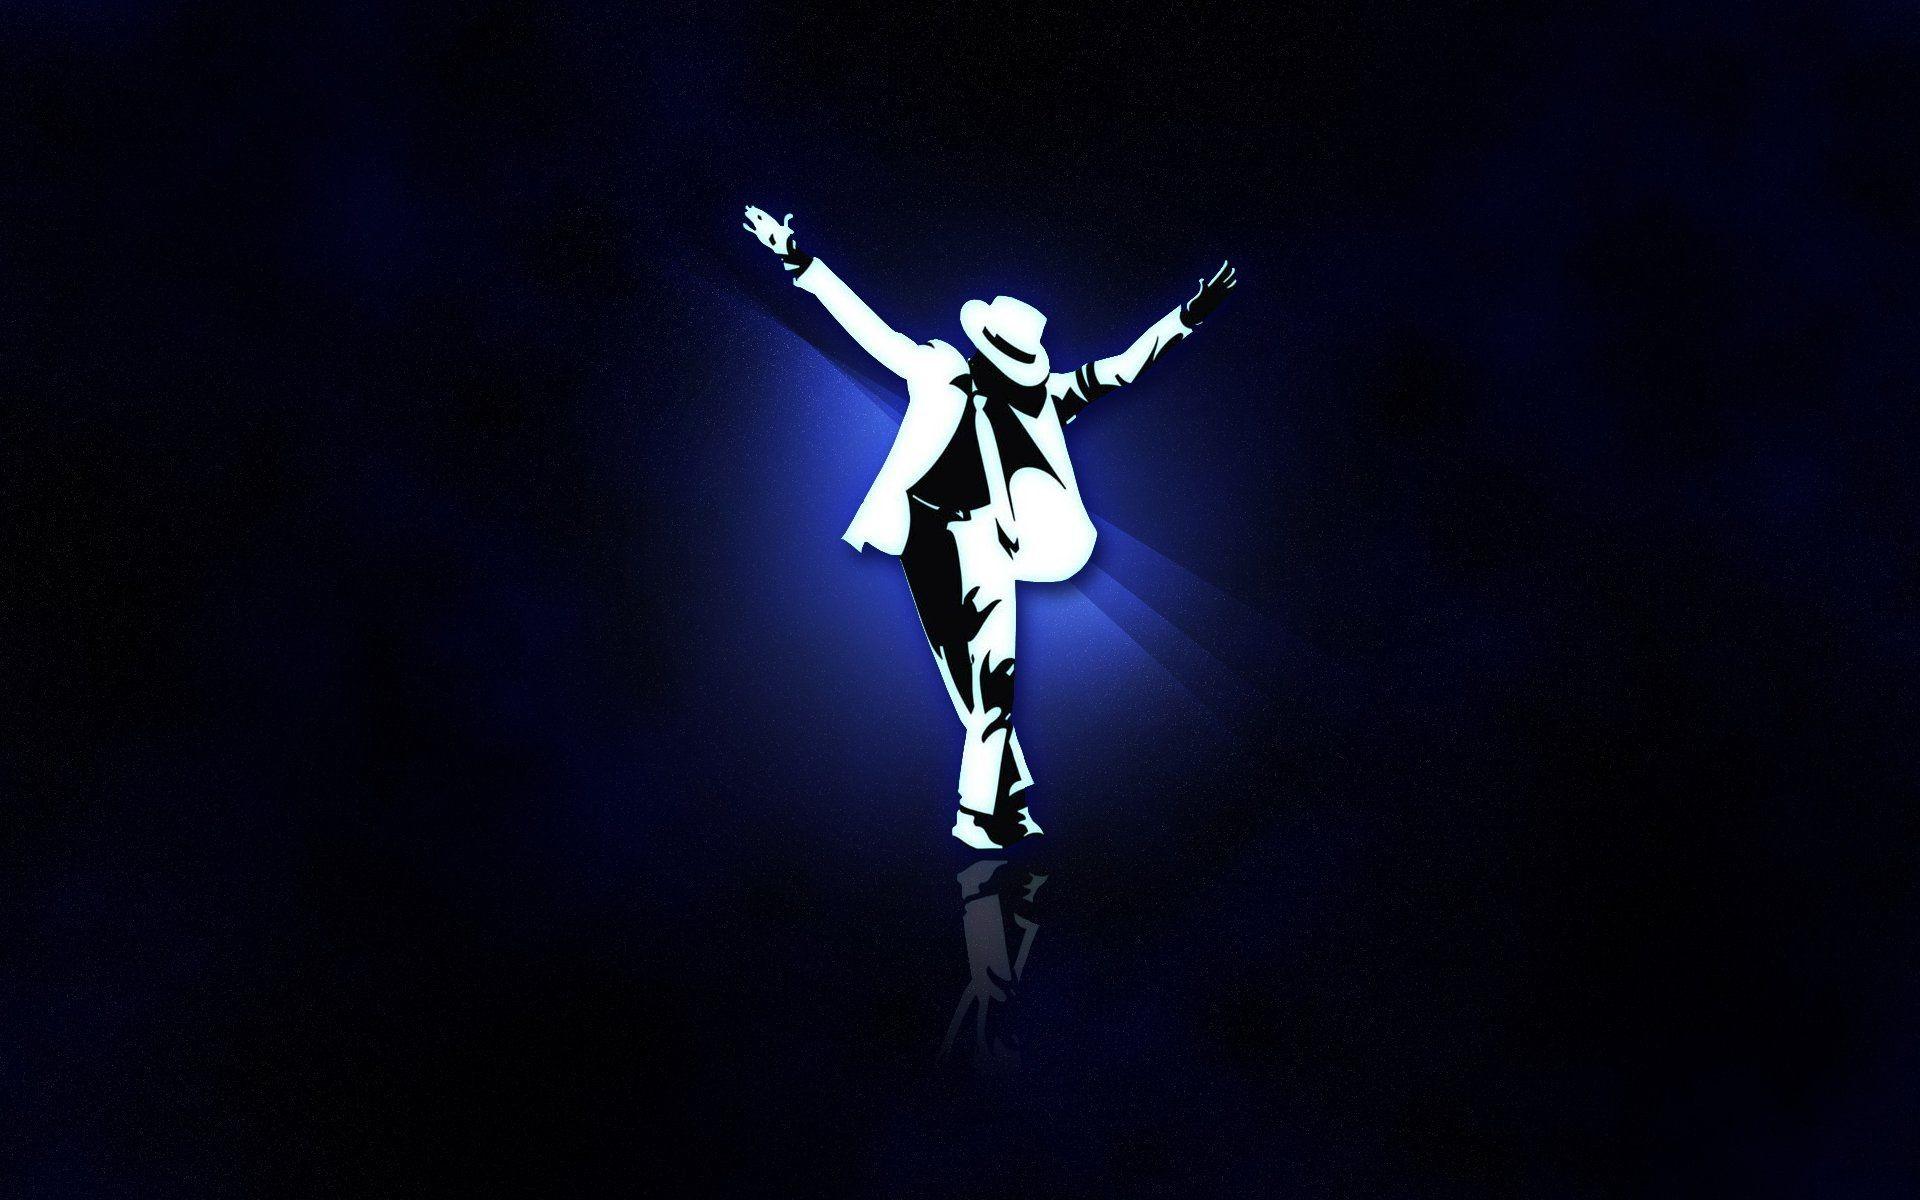 Michael Jackson Wallpaper ·① Download Free Cool Full HD